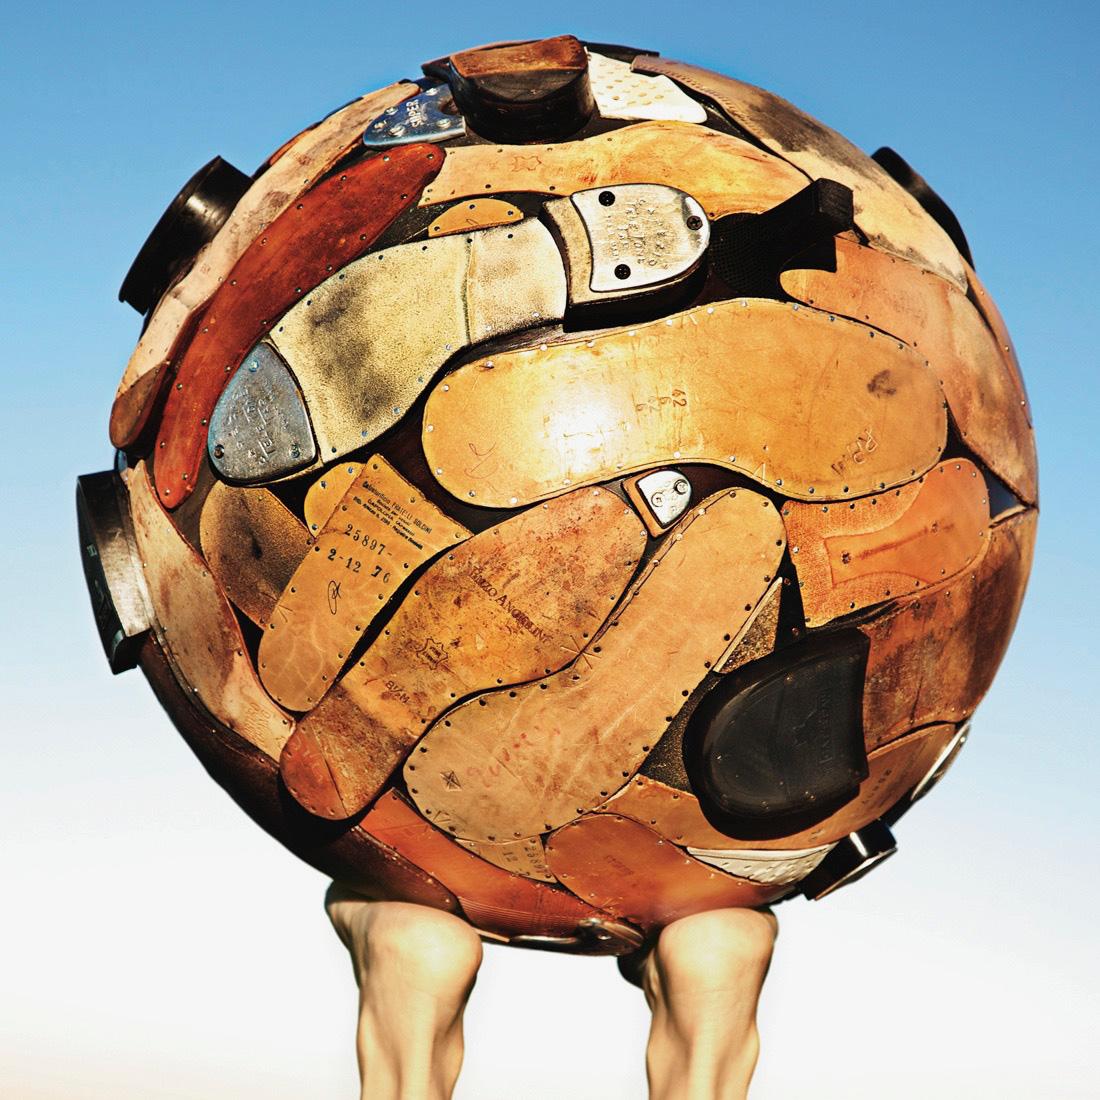 ron-miriello-grafico-san-diego-100-worlds-project-sculpture-globe-Miriello-branding-officina-10.jpg